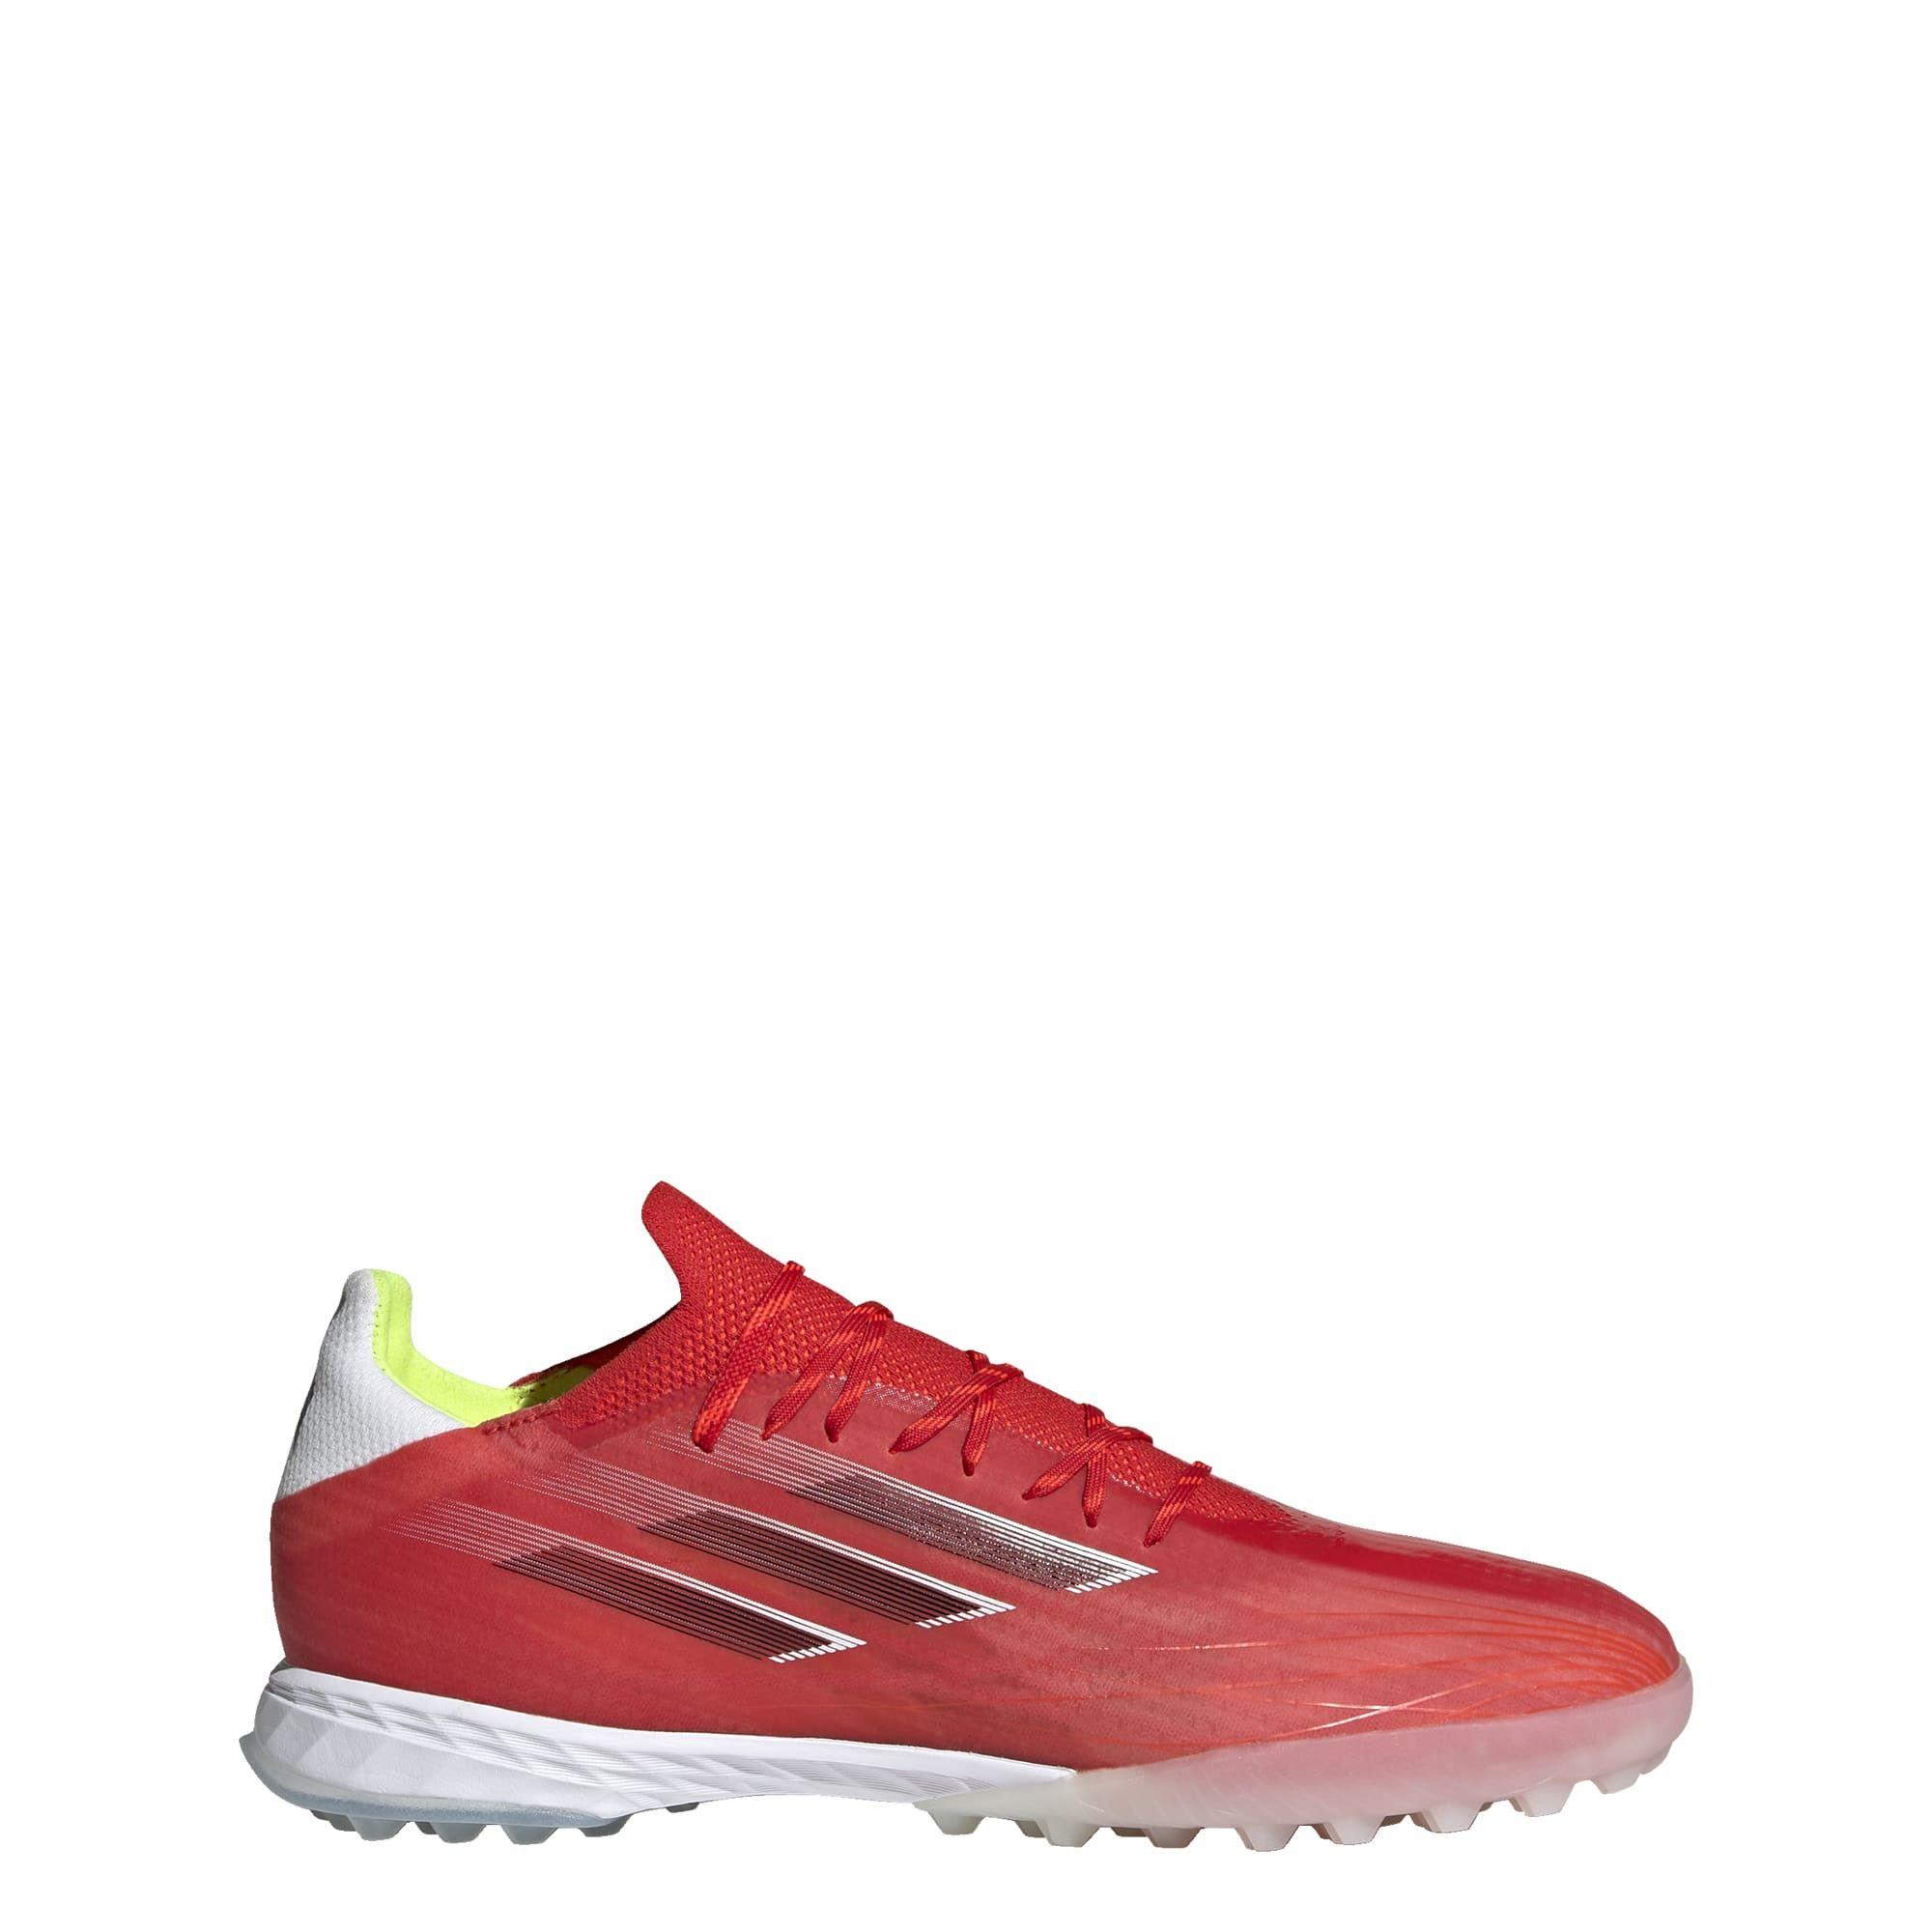 adidas X Speedflow.1 Turf Voetbalschoenen (TF) Rood Wit